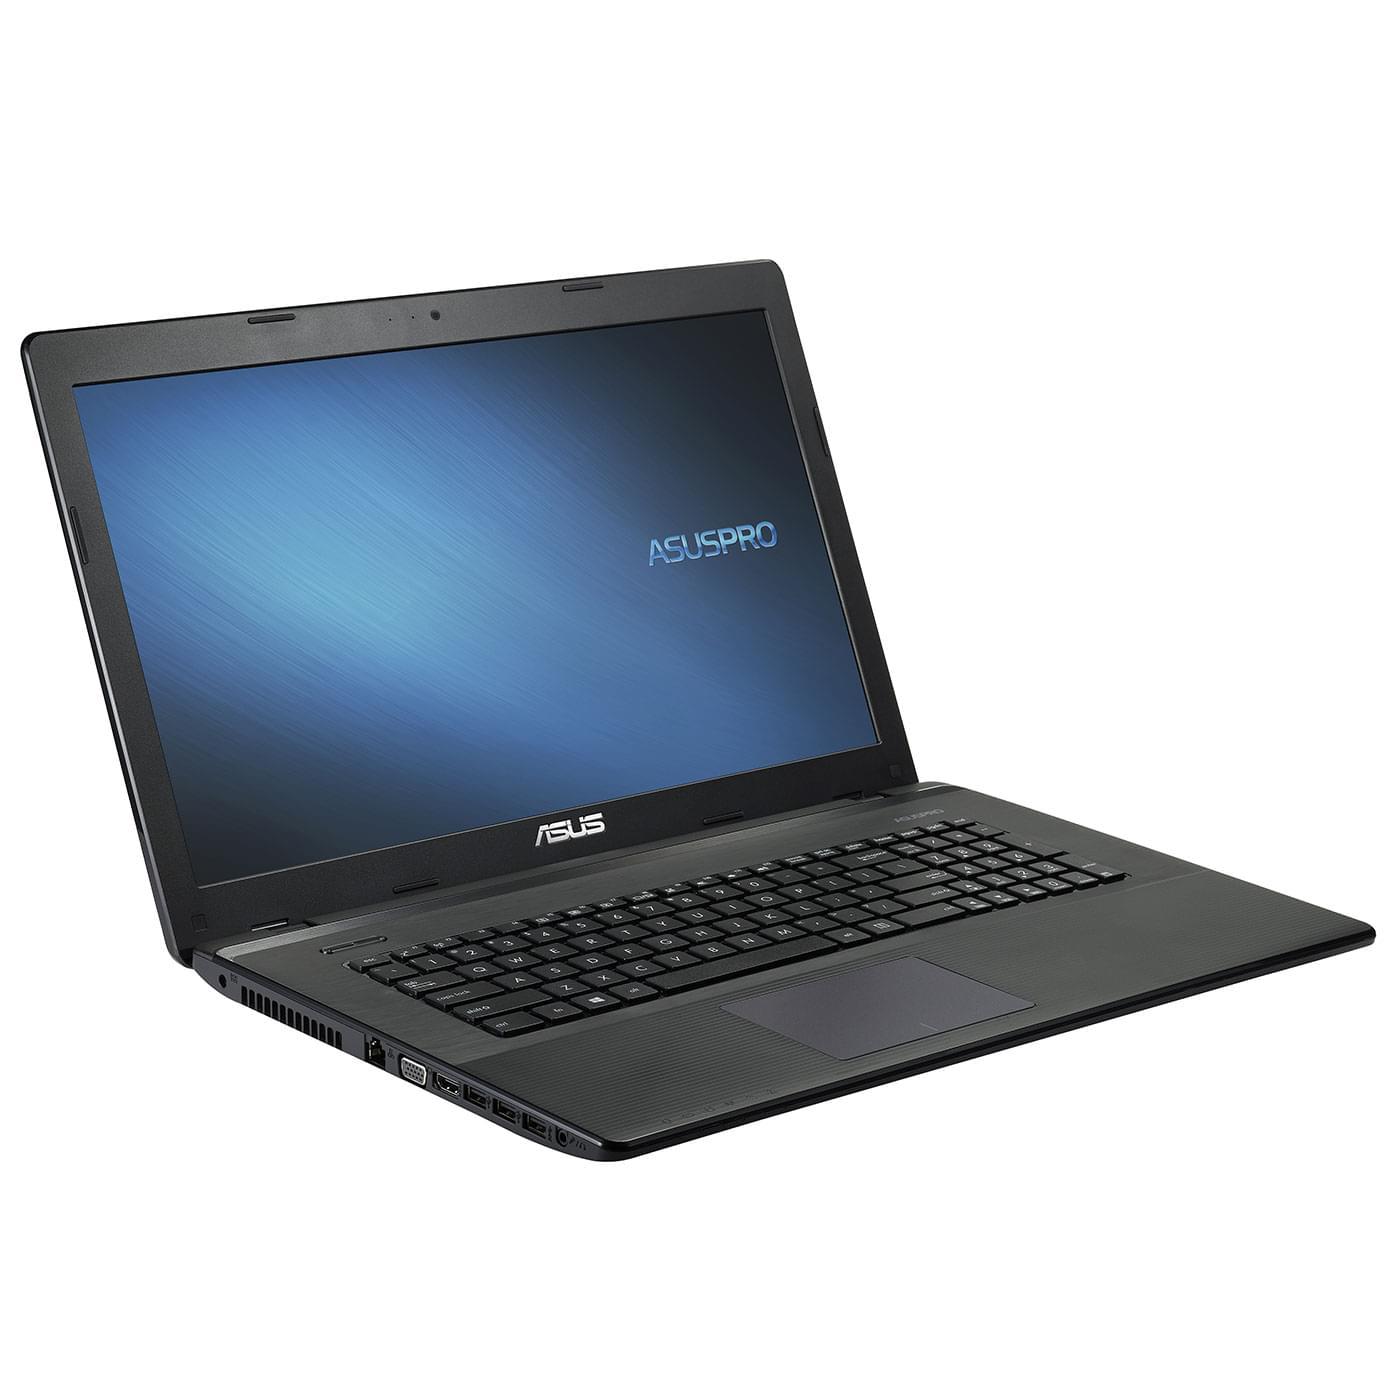 Asus P751JF-T2007G - PC portable Asus - Cybertek.fr - 0